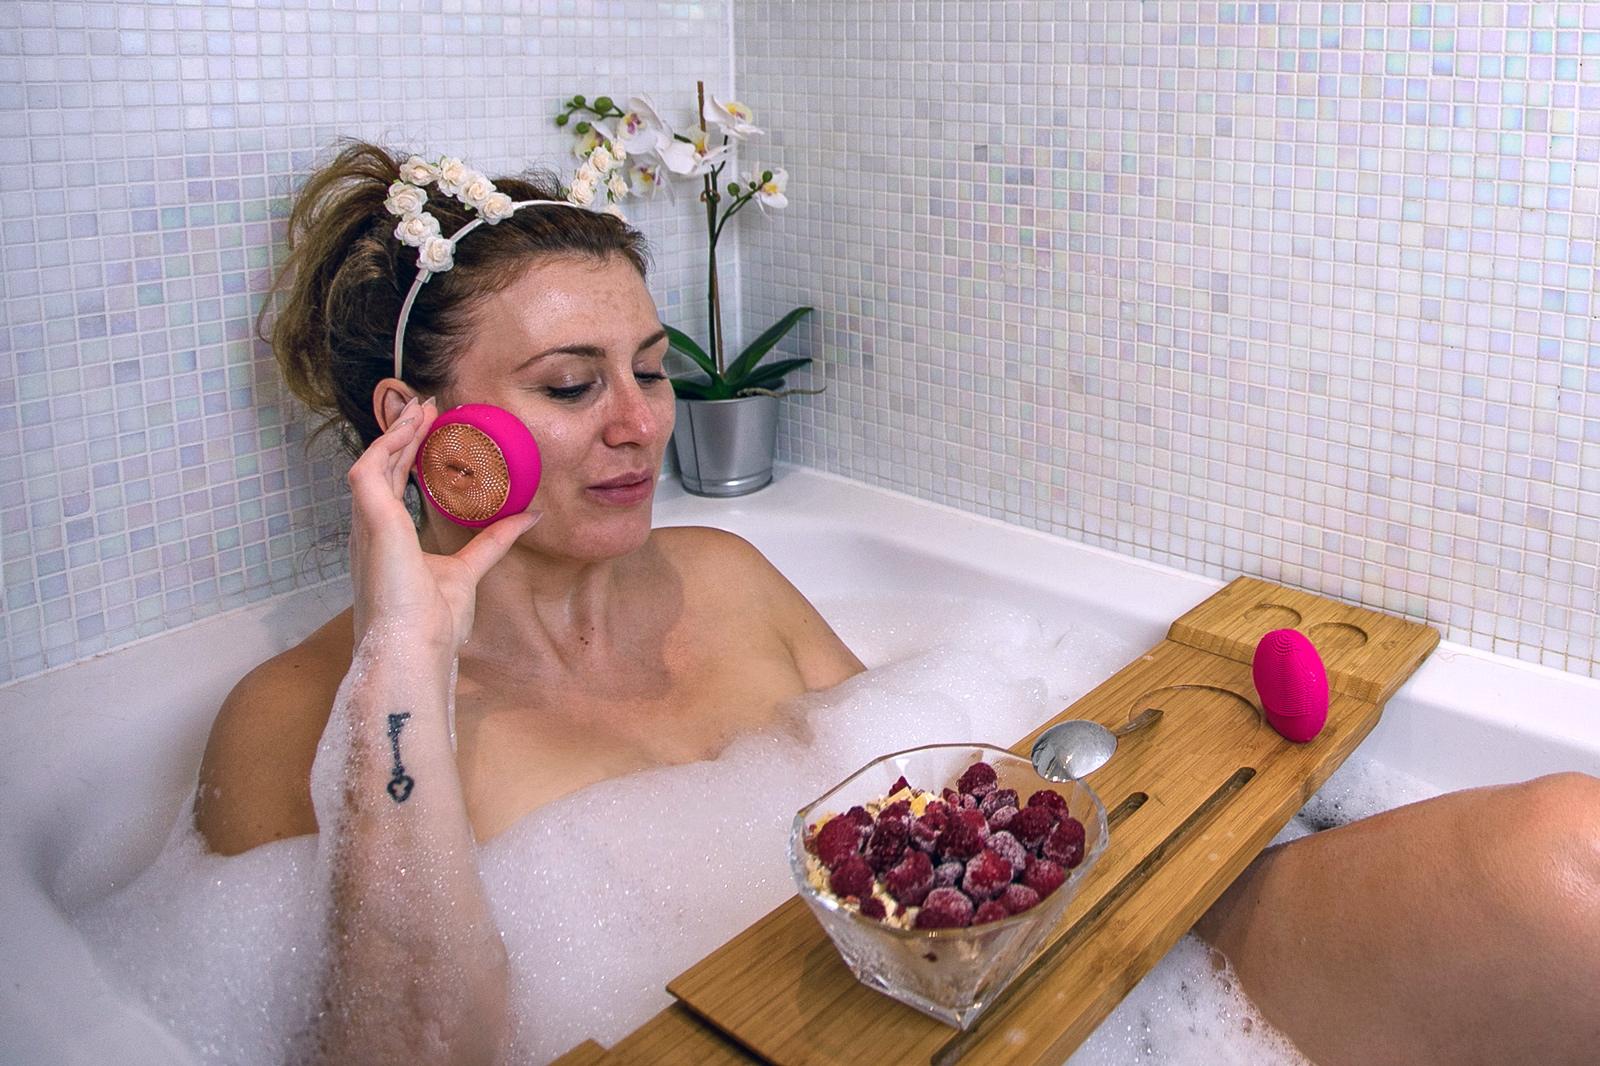 1600-nadja-nemetz-nadjanemetz-beauty-vienna-blogger-austrianblogger-violet-fleur-violetfleur-beautyblogger-foreo-ufo-foreoufo-19